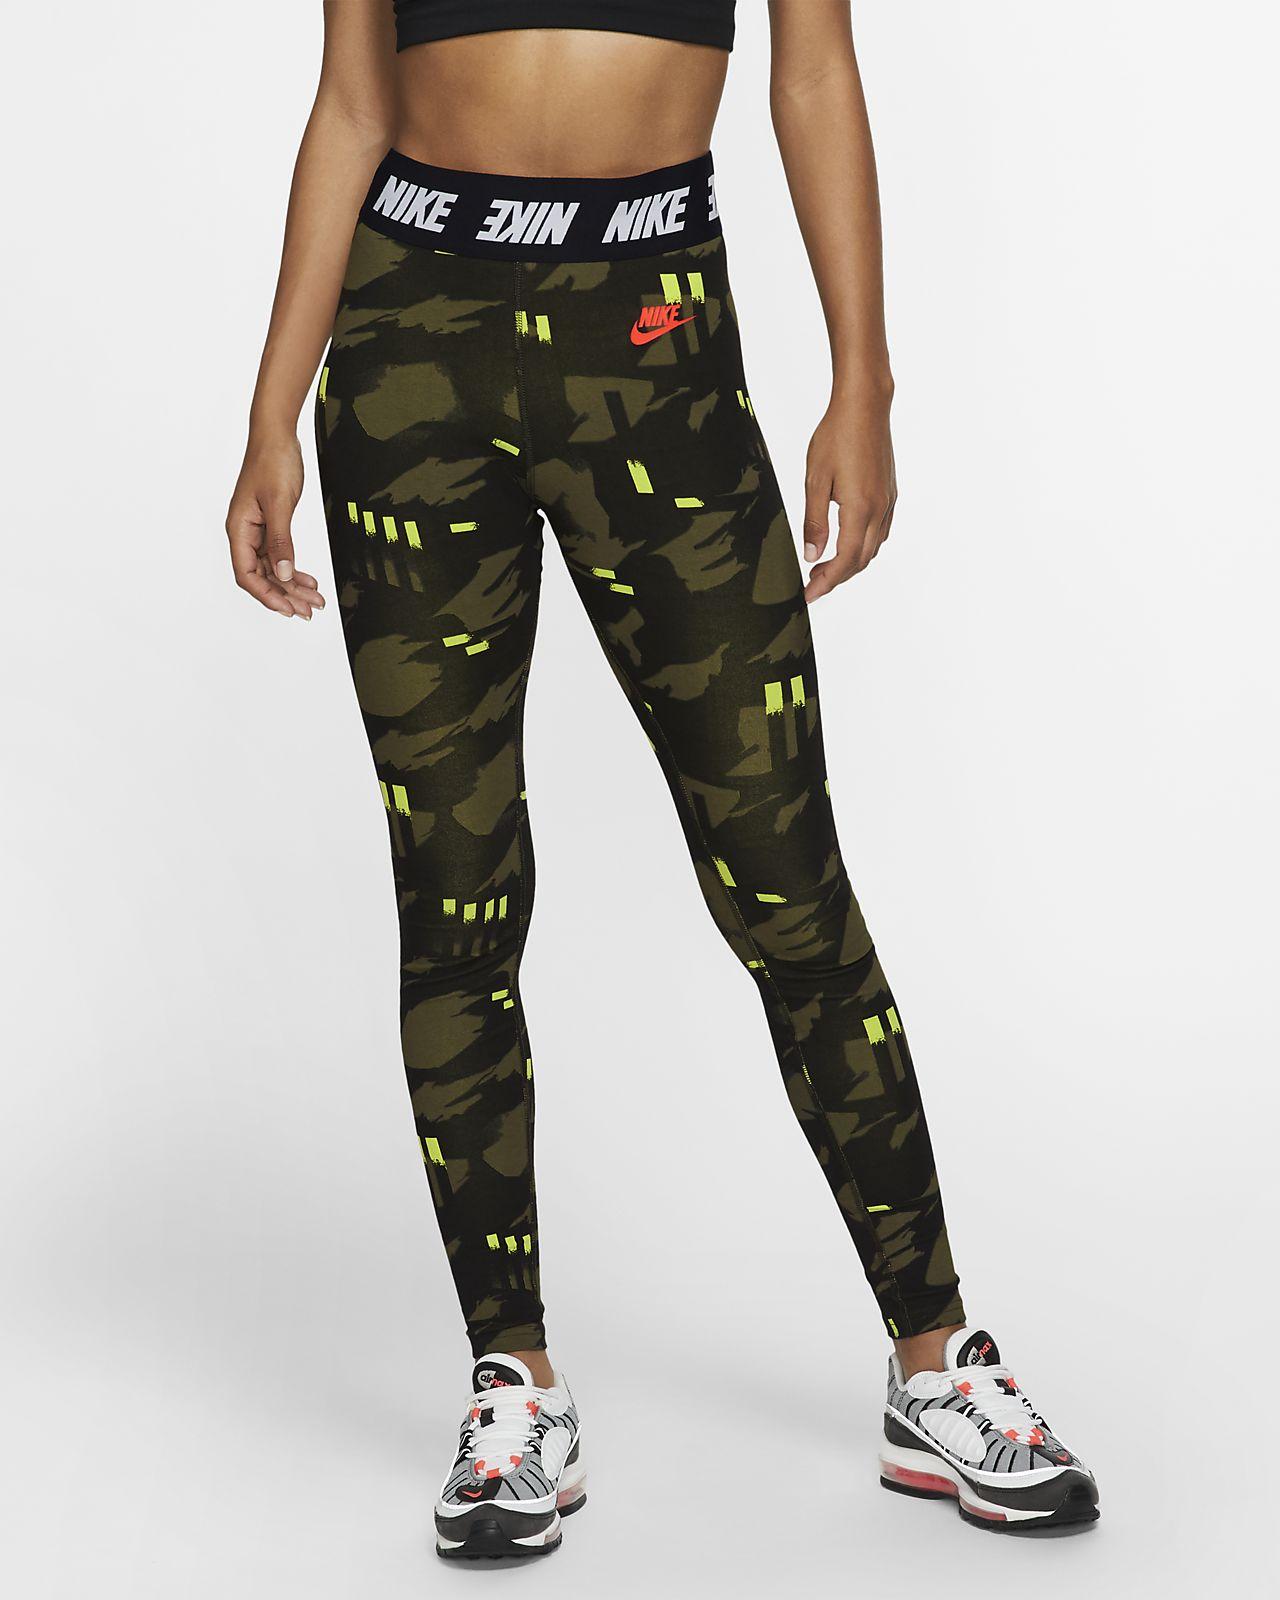 Legging taille haute imprimé Nike Sportswear pour Femme